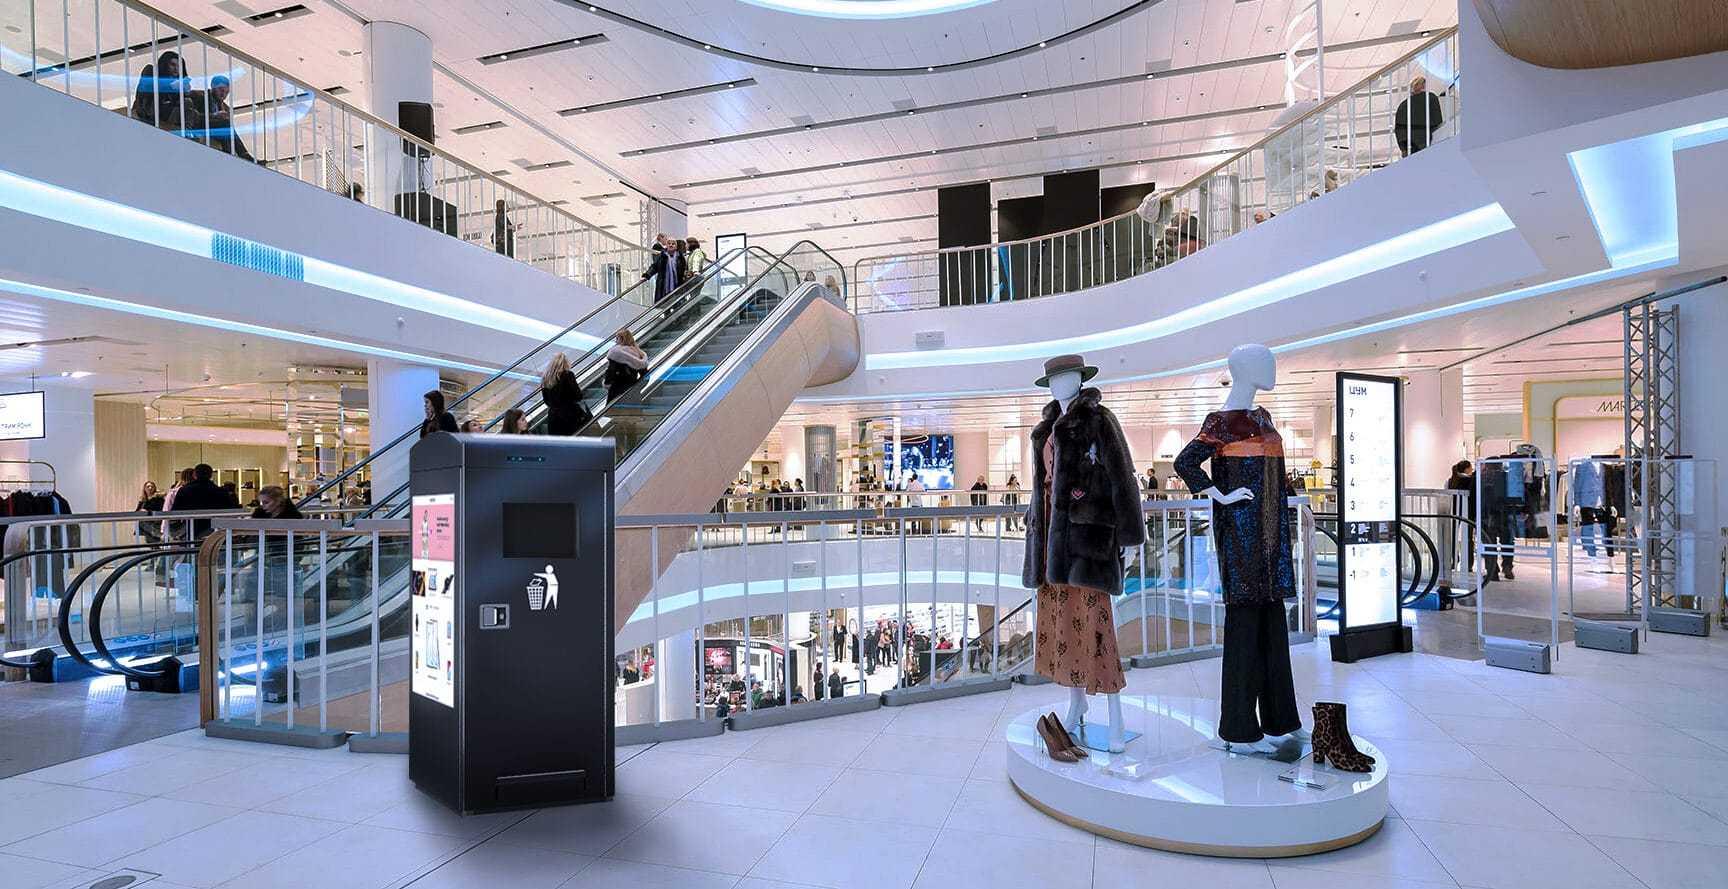 Smart City Bin Indoor TV in shopping mall